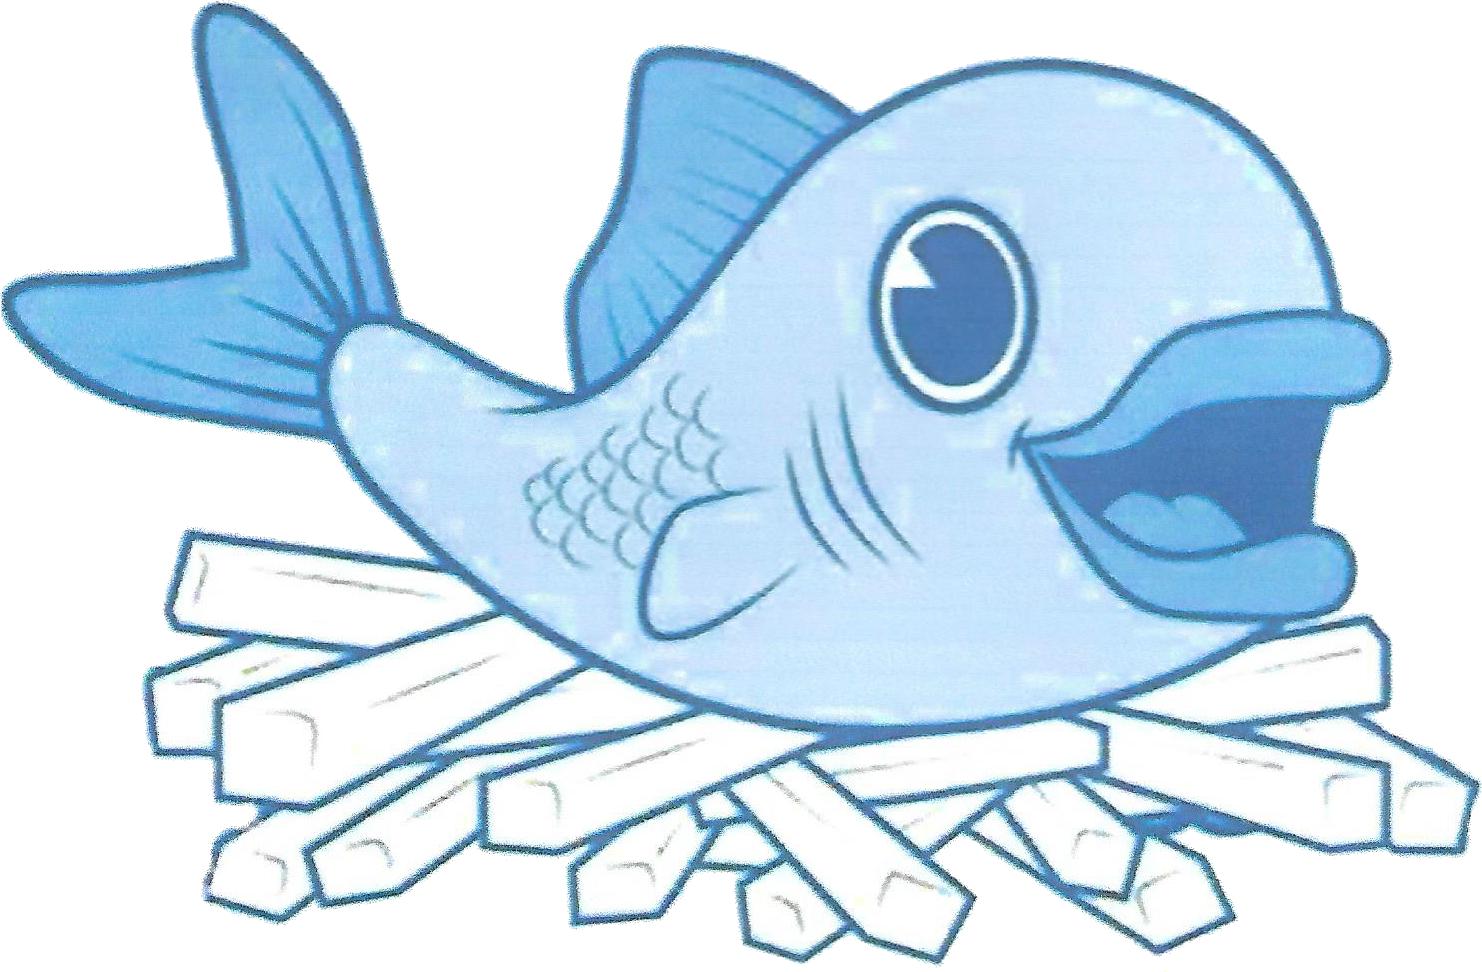 Shop clipart fish and chip shop, Shop fish and chip shop.